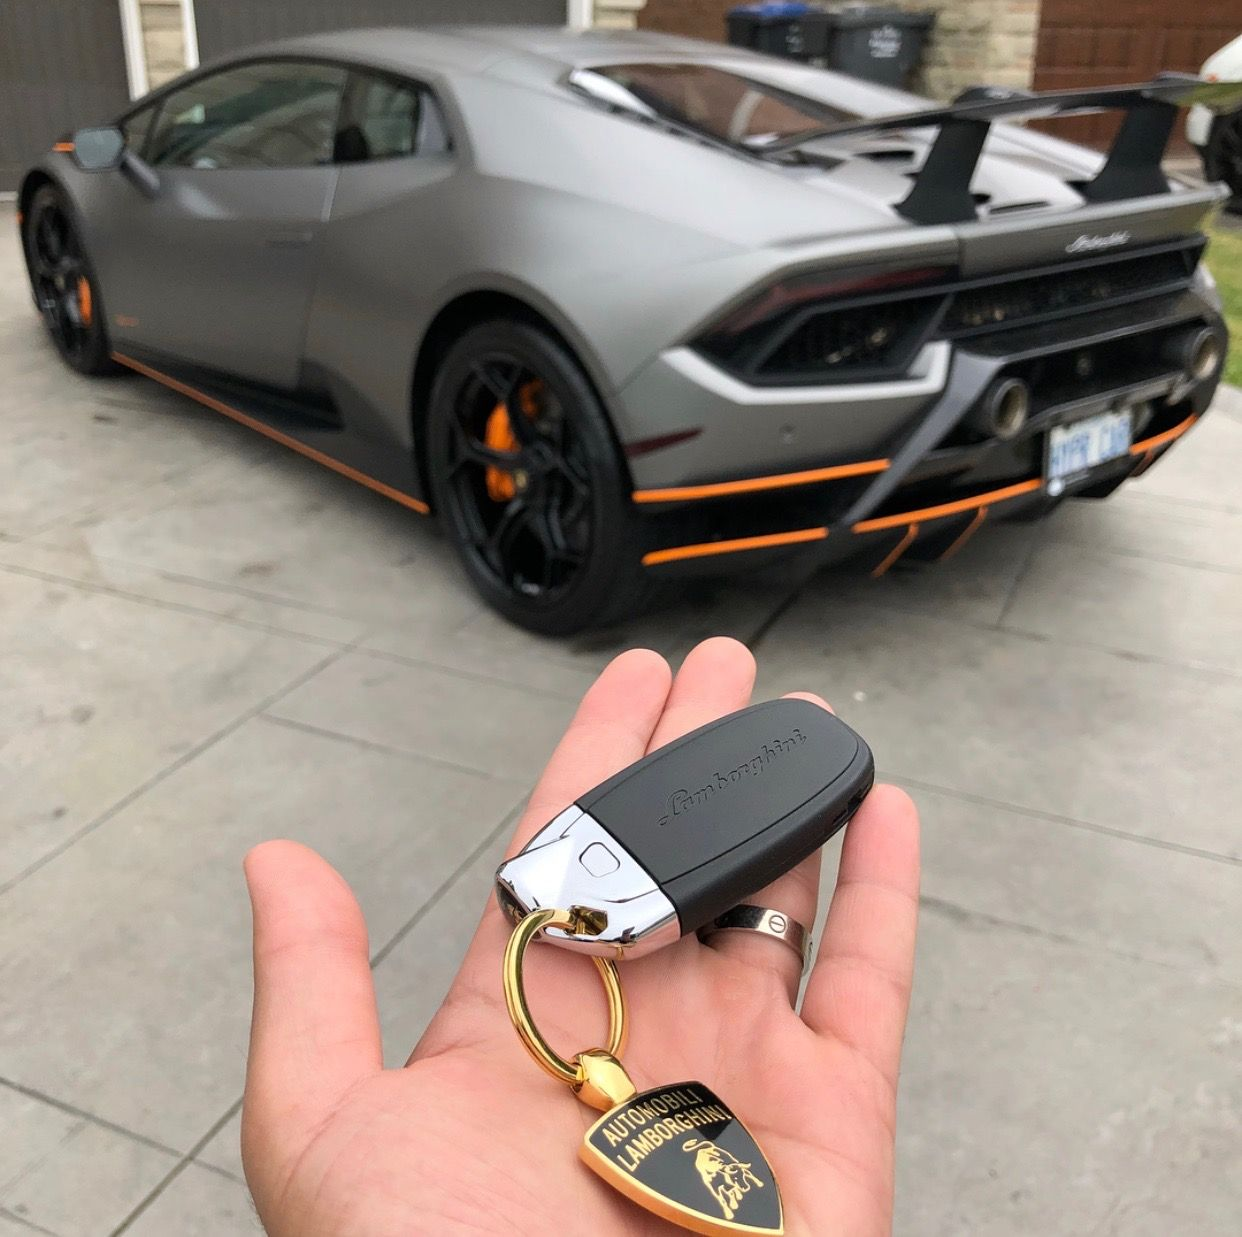 The Key Of The Lamborghini Huracan Performante Painted In Grigio Titans W Orange Accents Photo Taken By Ali Lamborghini Sports Cars Lamborghini Accent Car